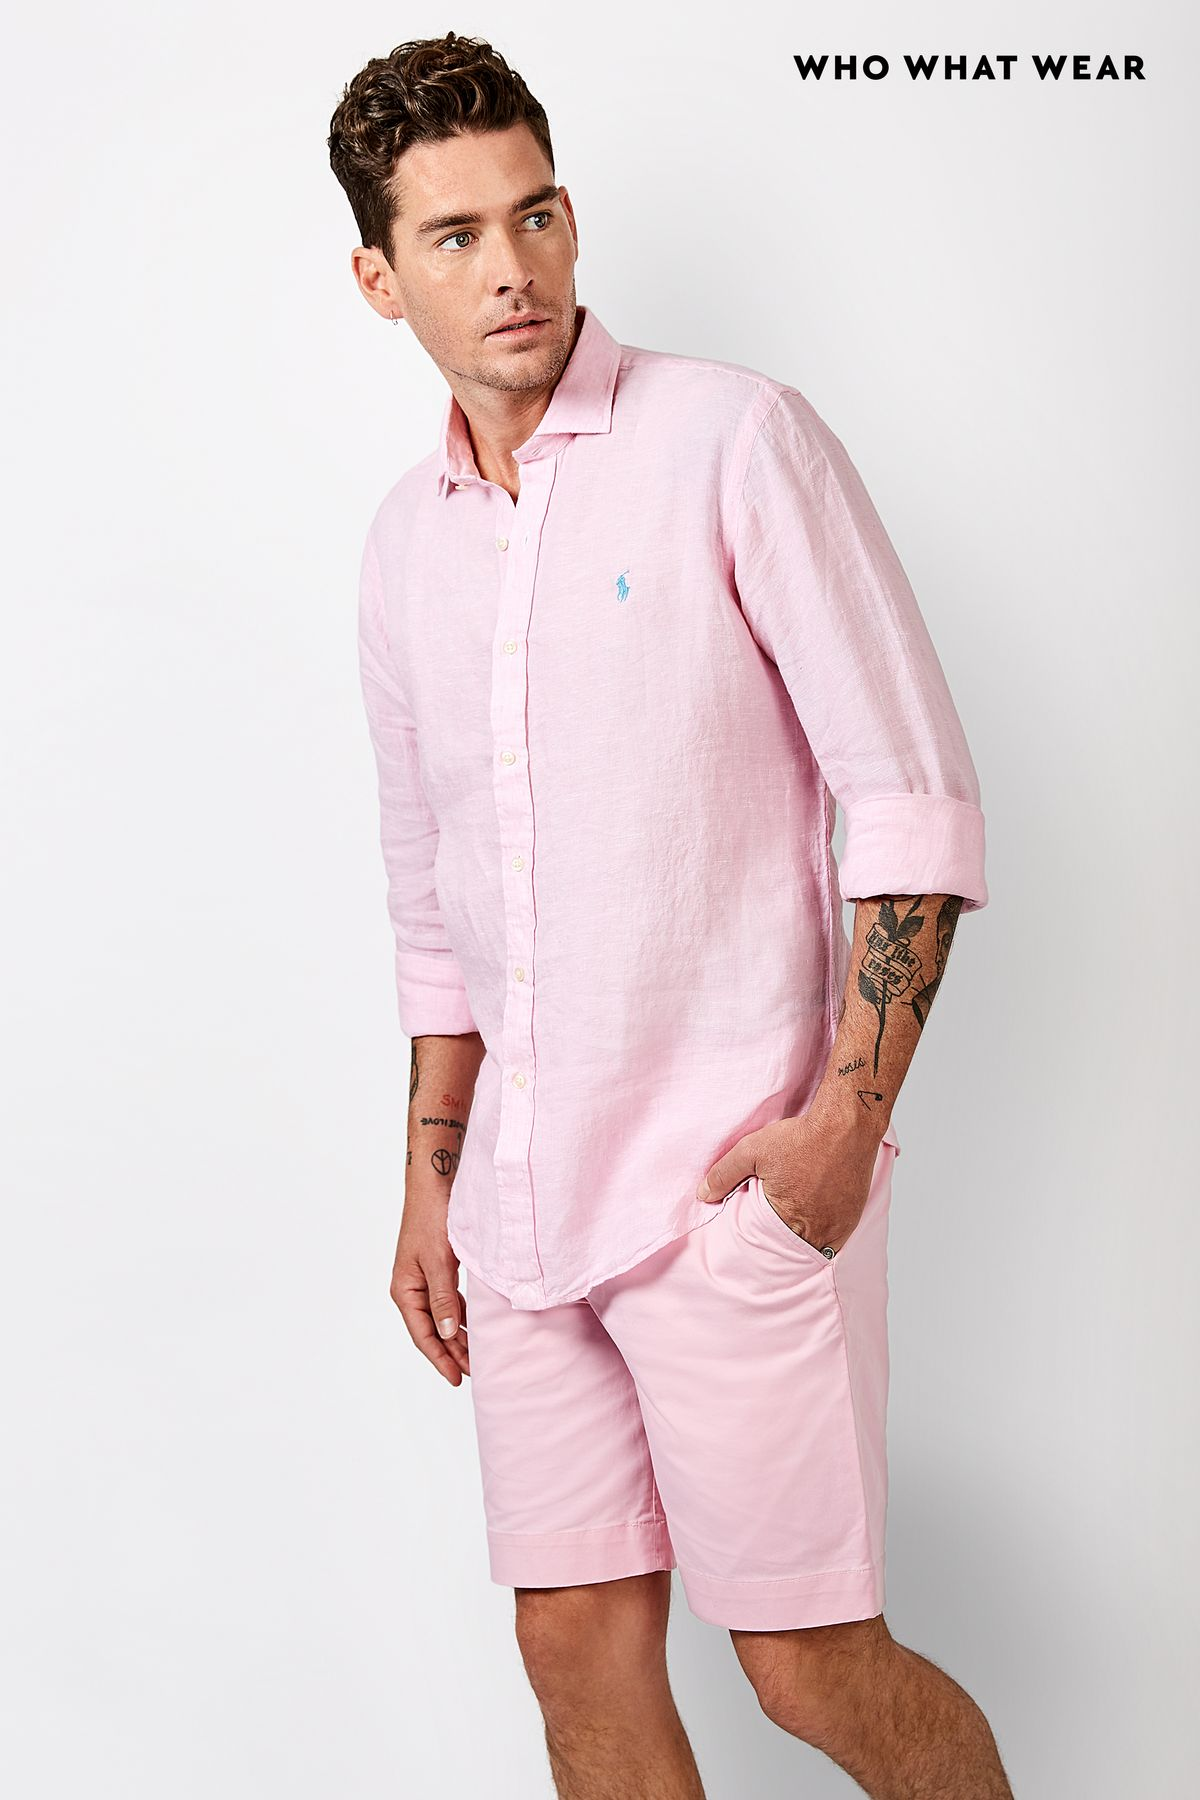 Joliffe wears: Polo Ralph Lauren Men's Classic Fit Linen Shirt ($179), Polo Ralph LaurenMen's Stretch Classic Fit Shorts ($139)